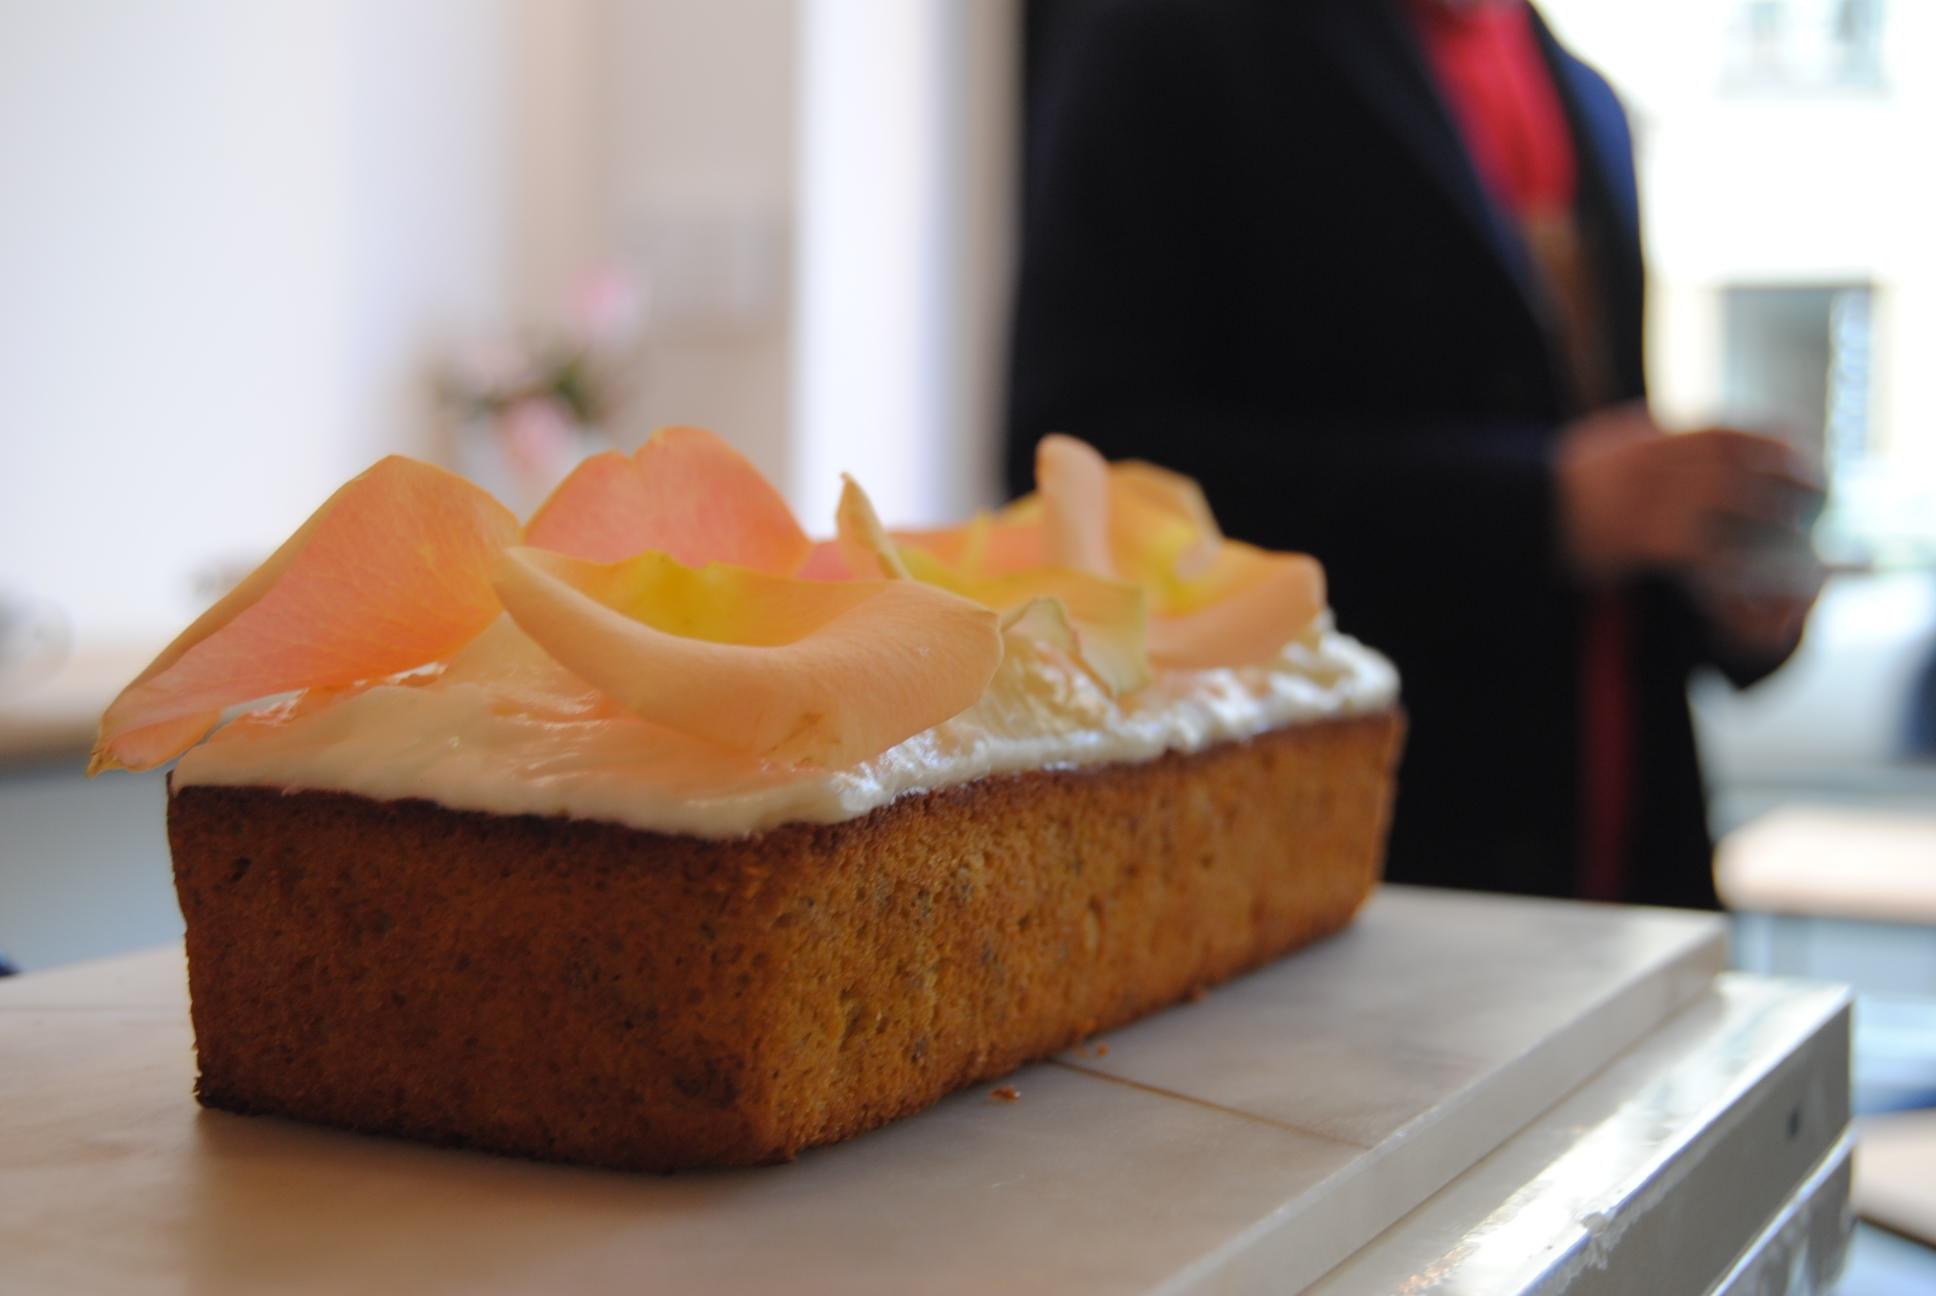 cake-paris-sprezzatura-my-parisian-life-coffee-meet-up